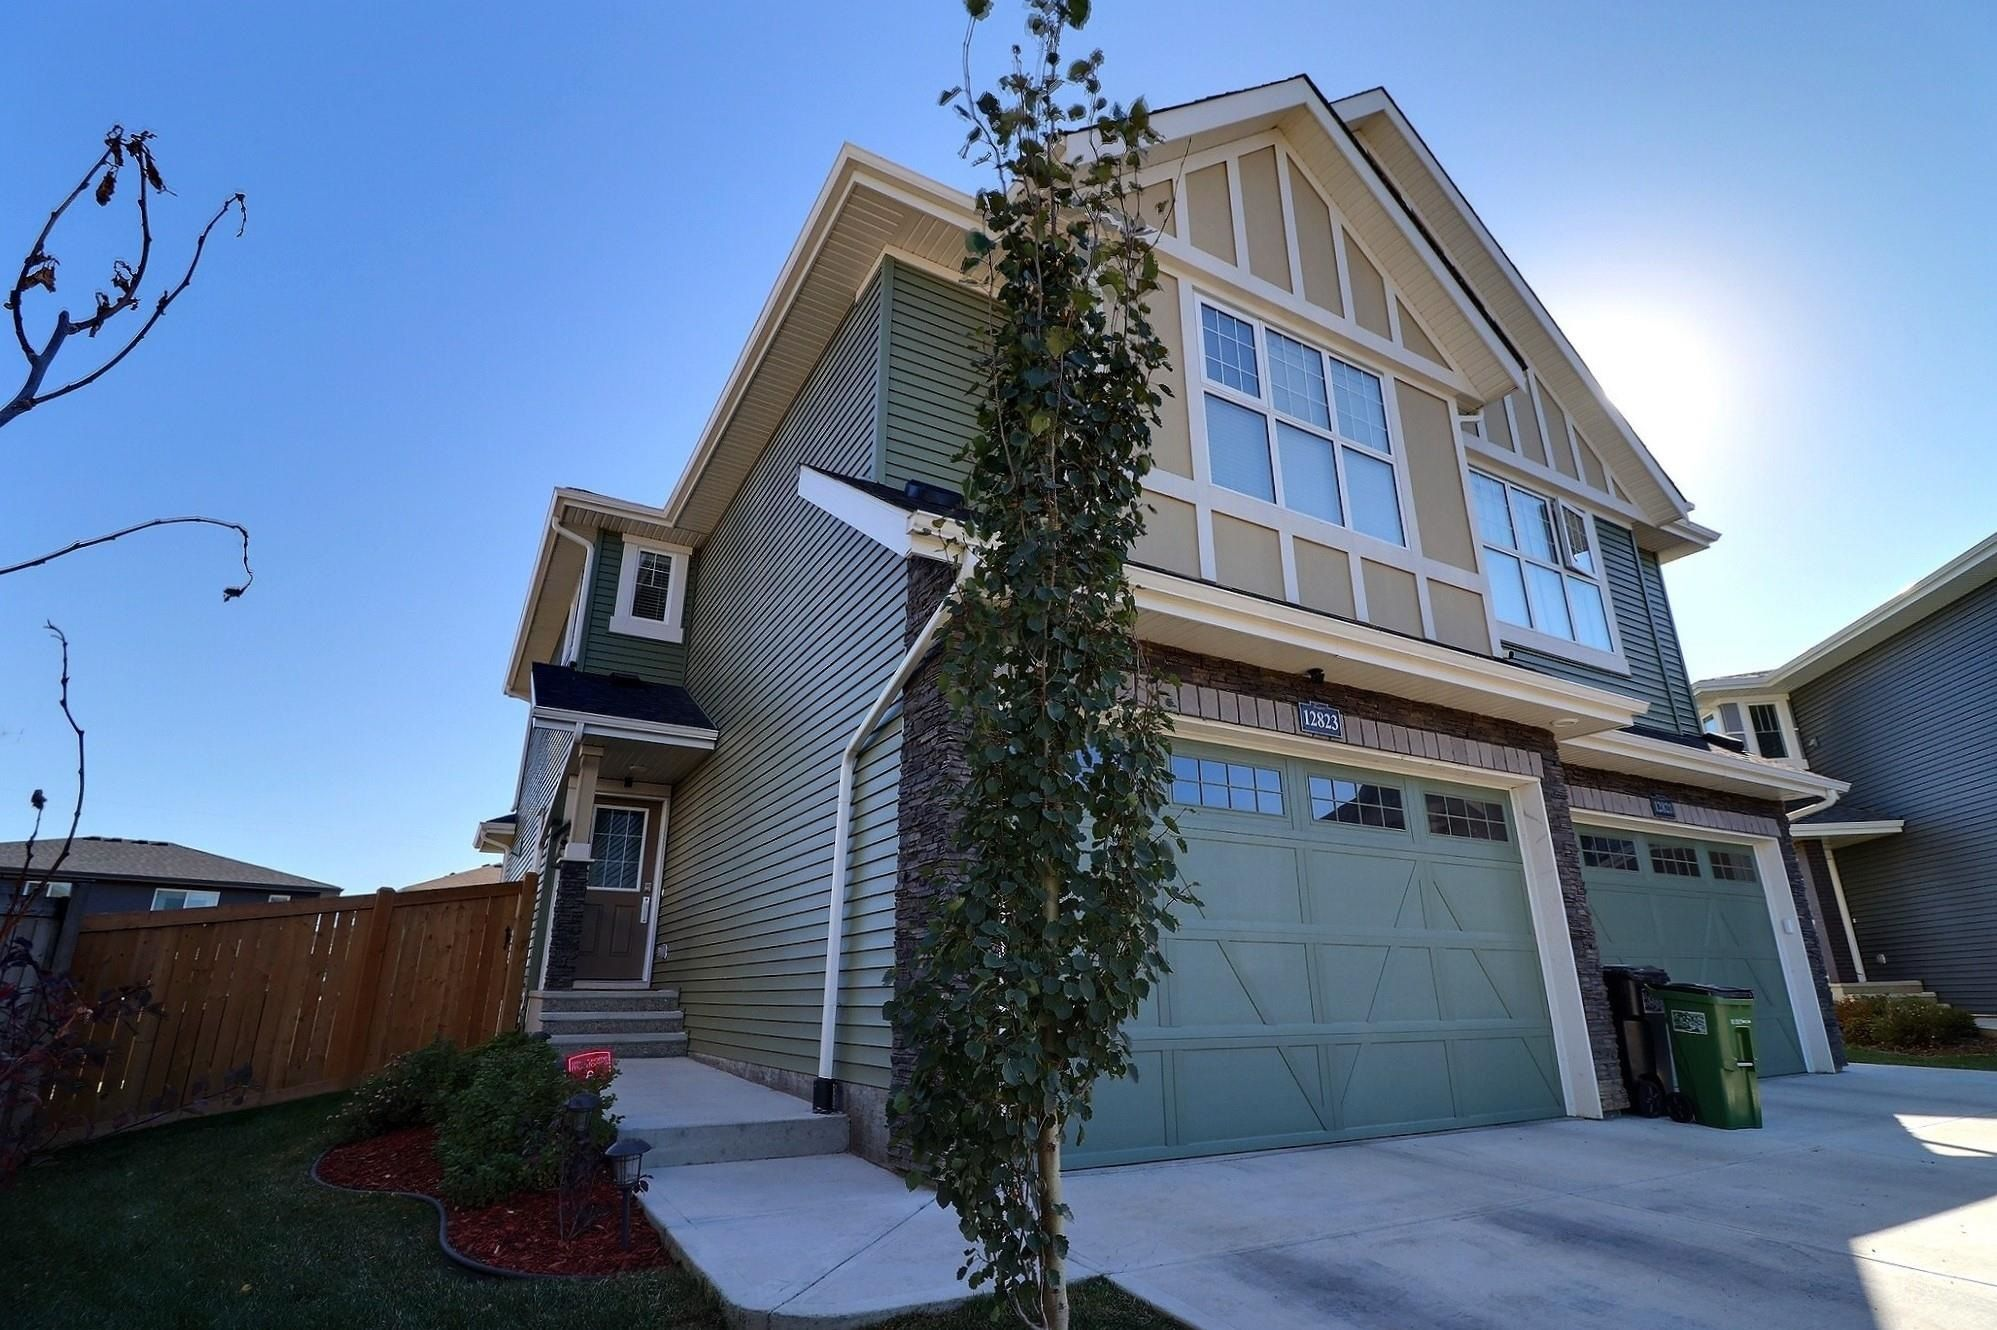 Main Photo: 12823 207 Street in Edmonton: Zone 59 House Half Duplex for sale : MLS®# E4265509